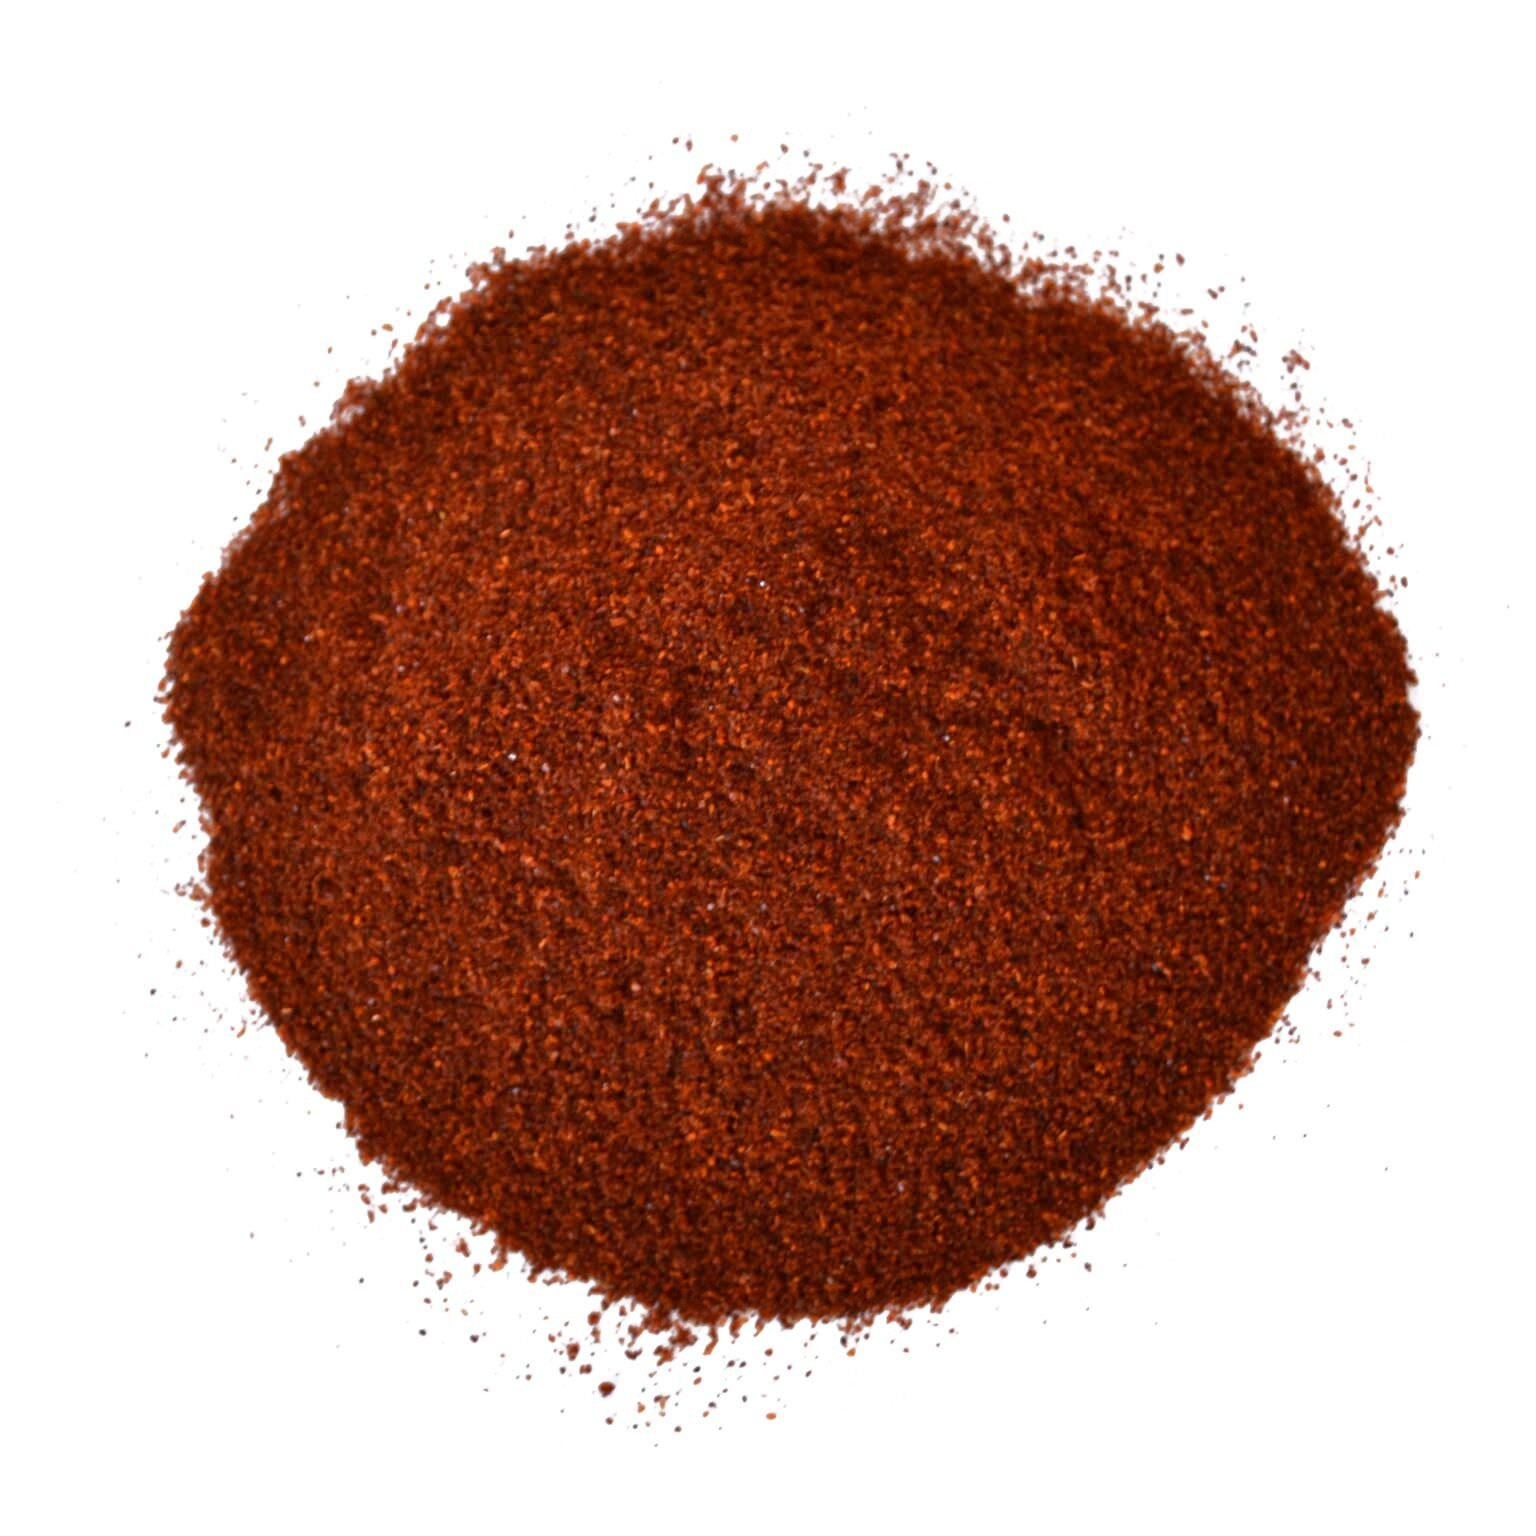 Paprika powder 120 ASTA, steam treated, ground bulk spice - 50 Lbs